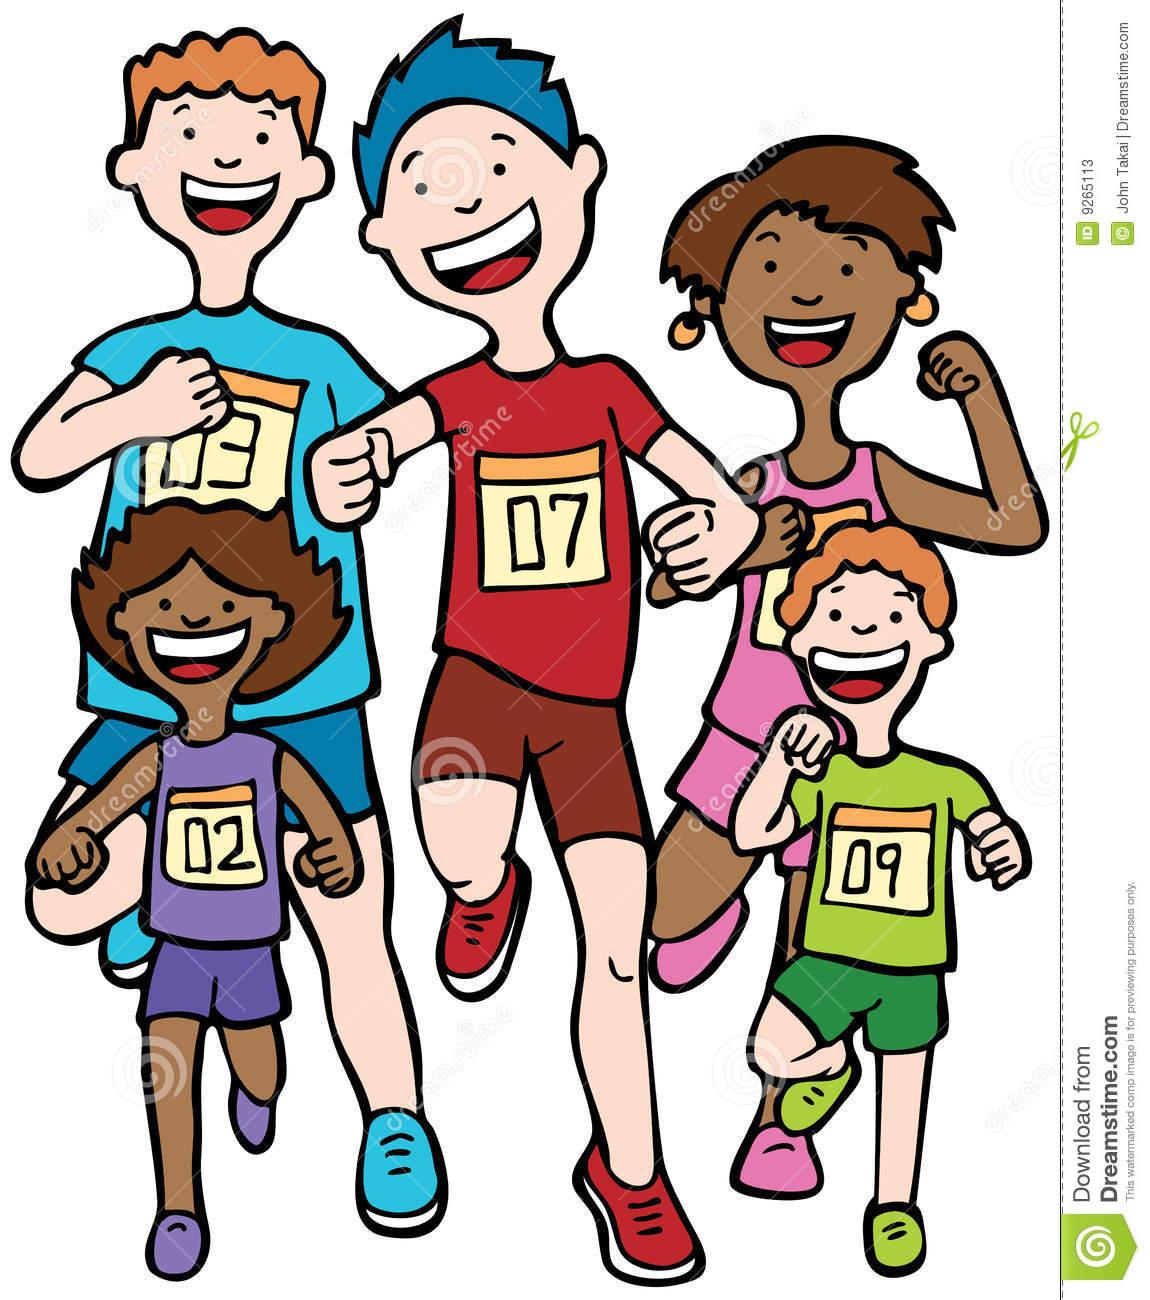 family running clipart - photo #41